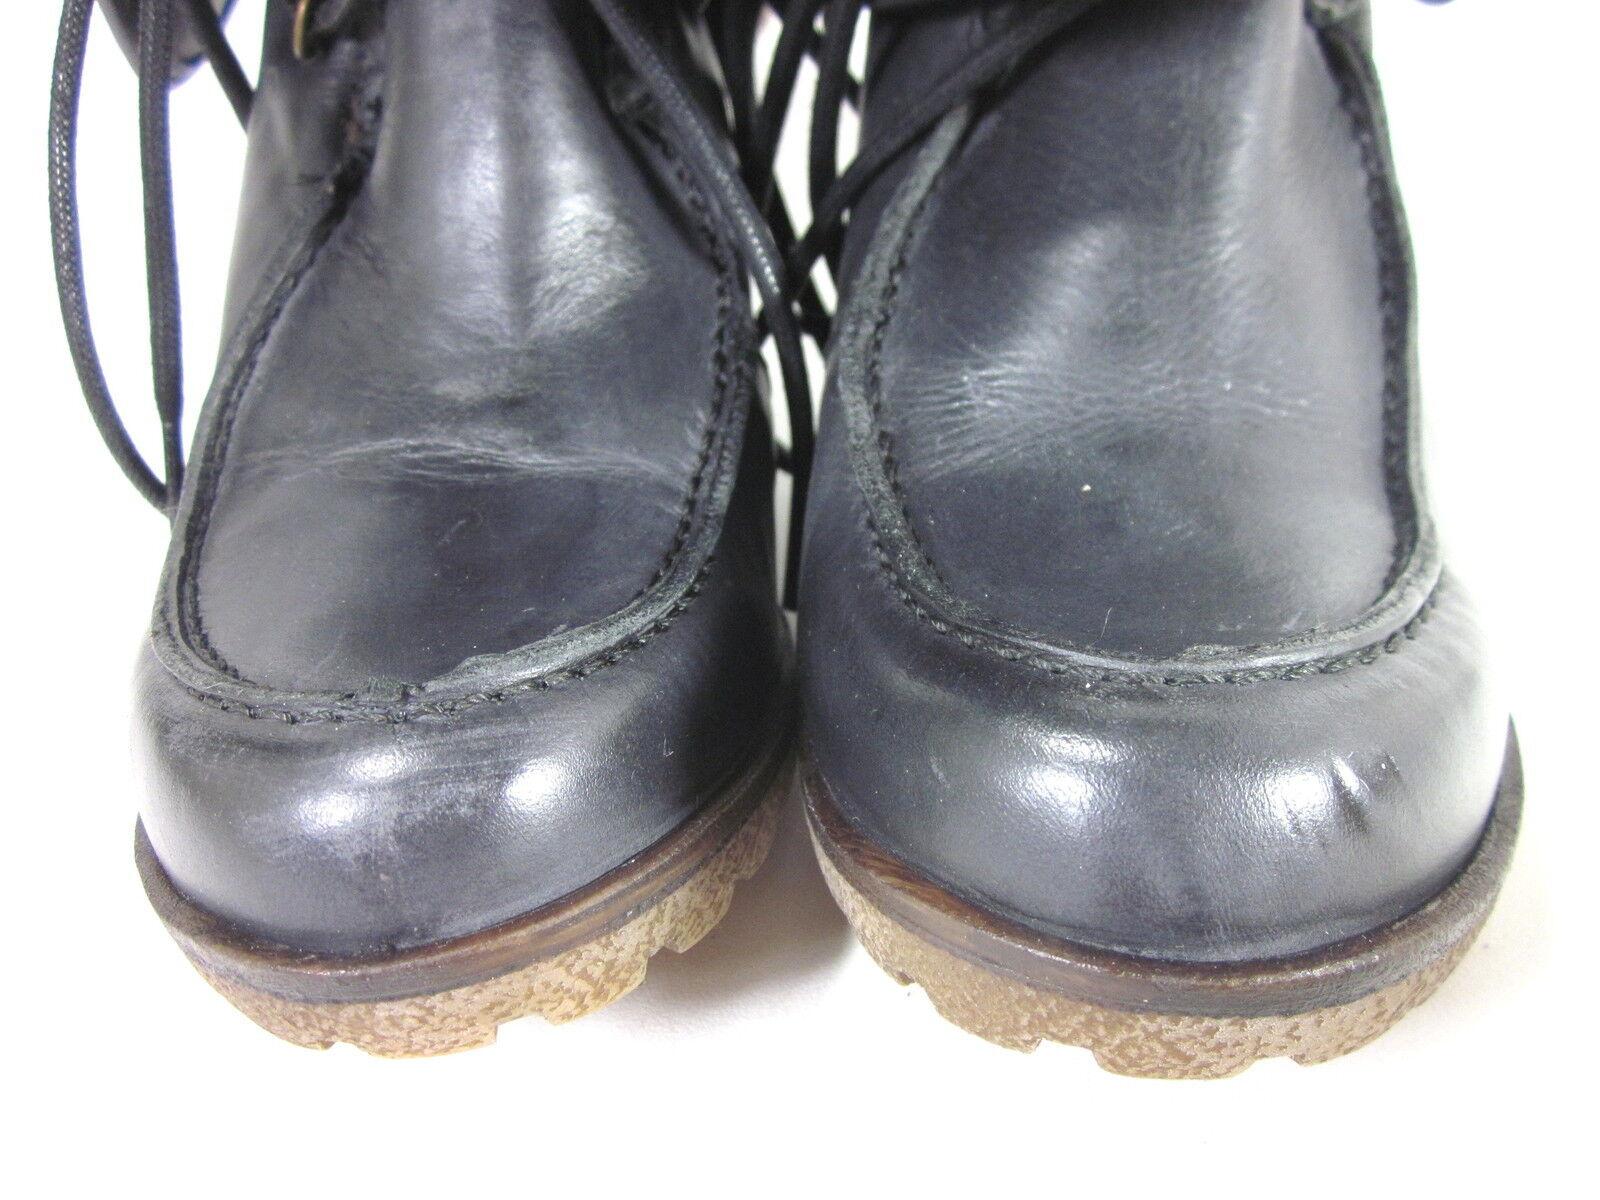 schuhe DIEM damen SD0359 SD0359 SD0359 StiefelIE GLASSE schwarzE LEATHER EUR SZ 38 US SZ 8 MEDIUM a57ac0